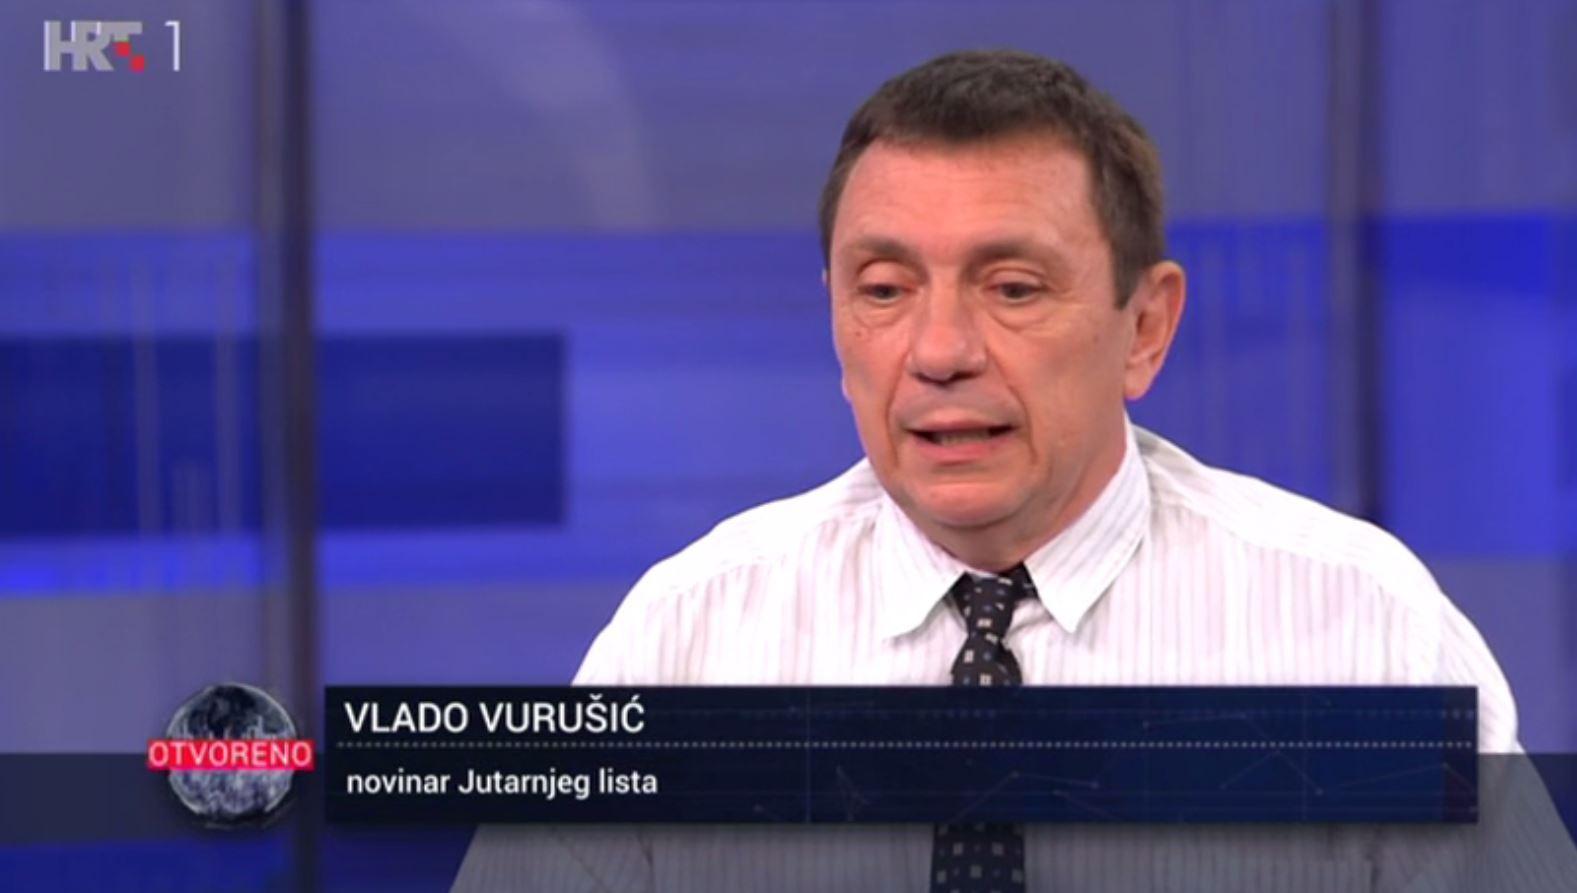 Vurusic